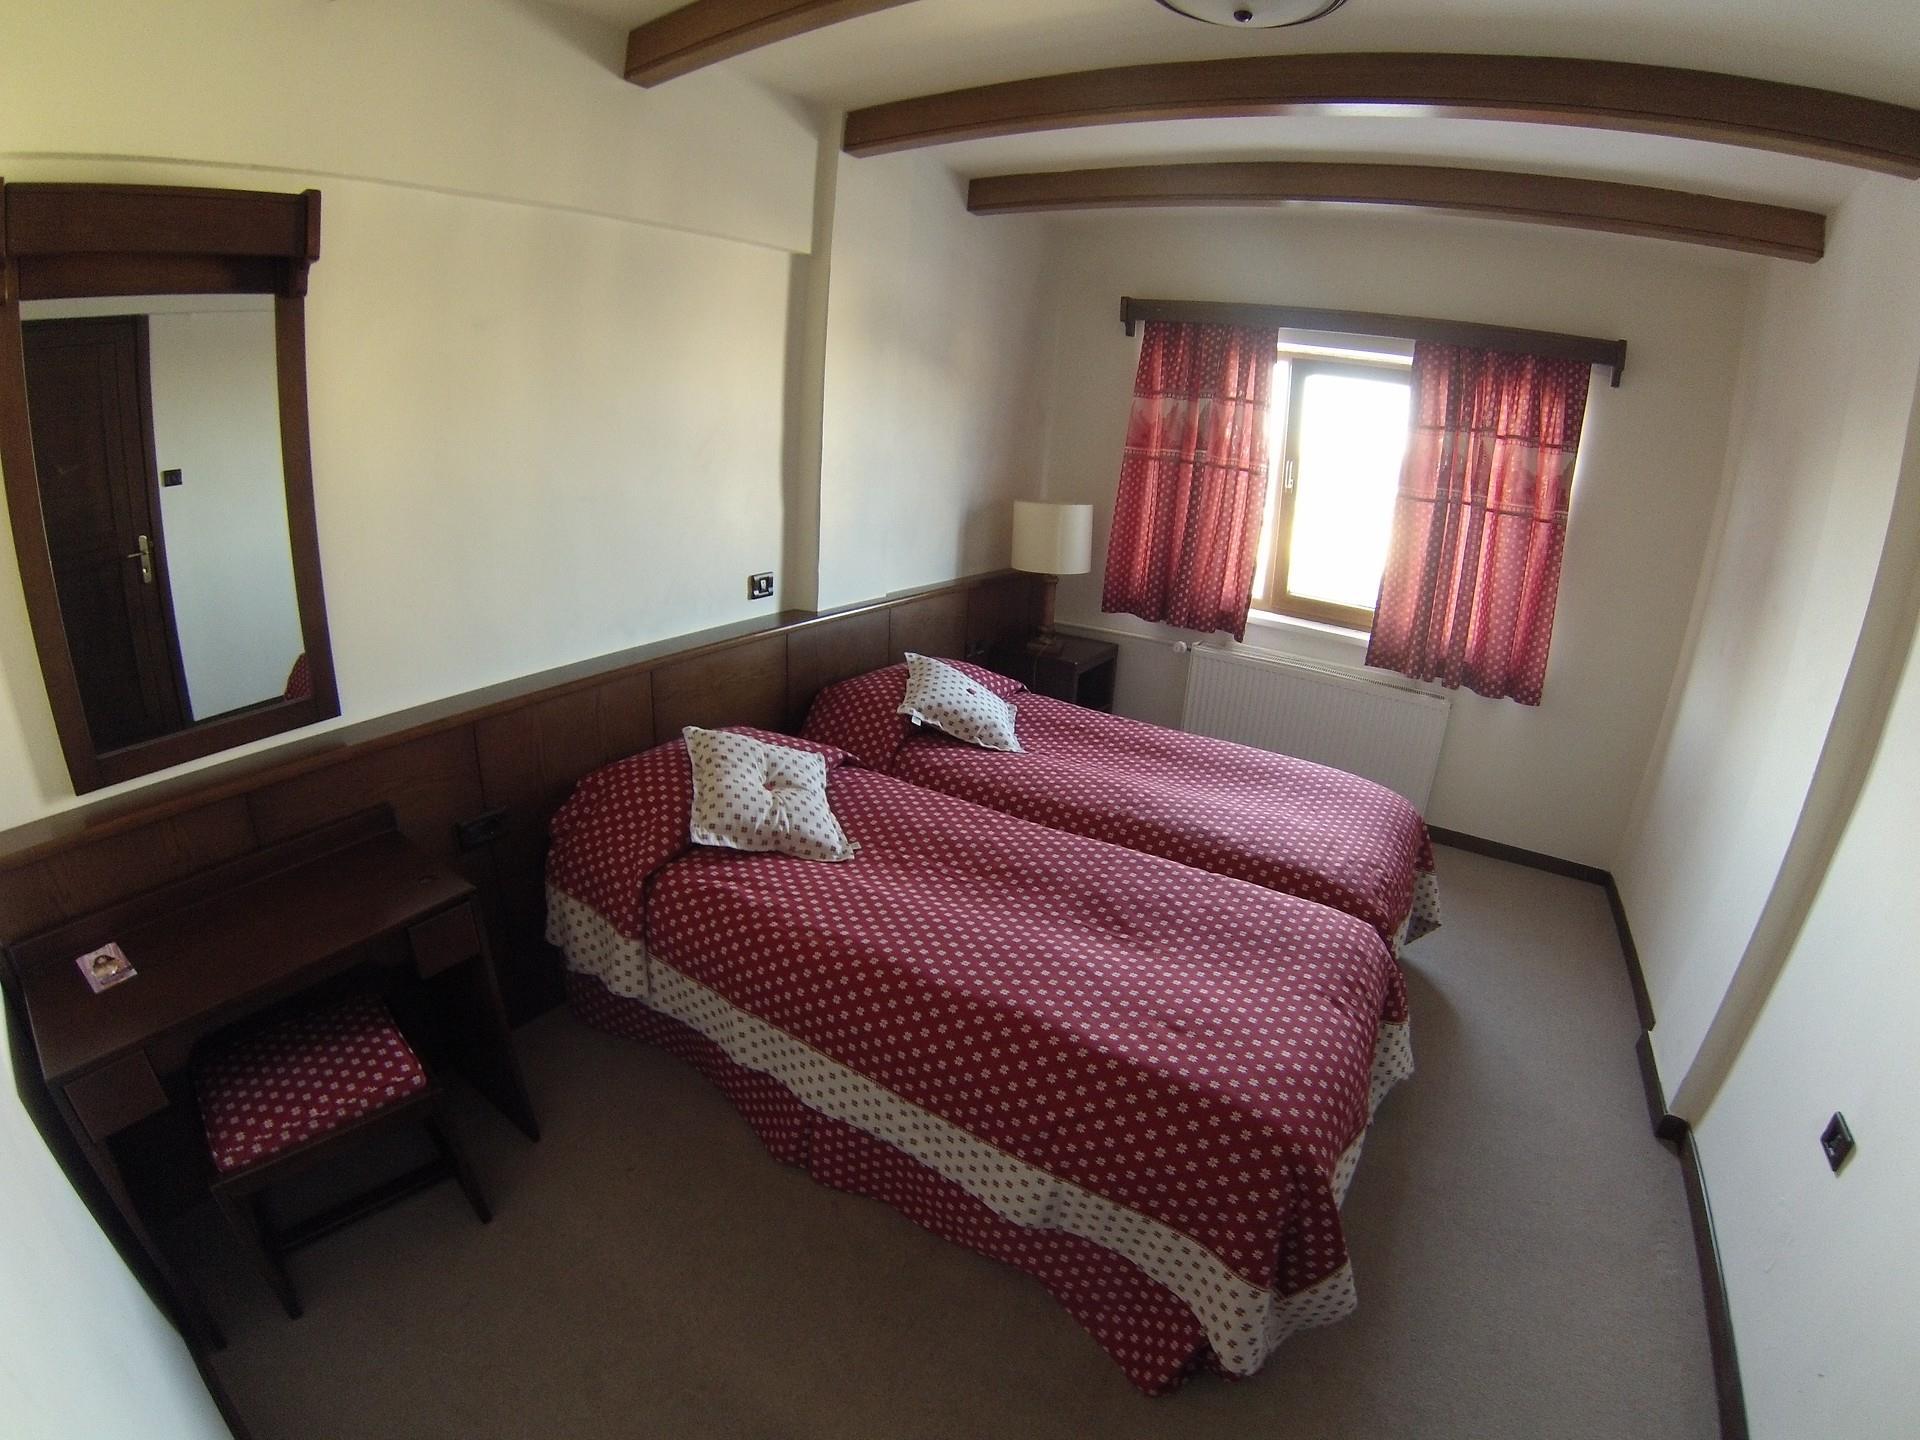 Beceren Hotel Uludağ203144